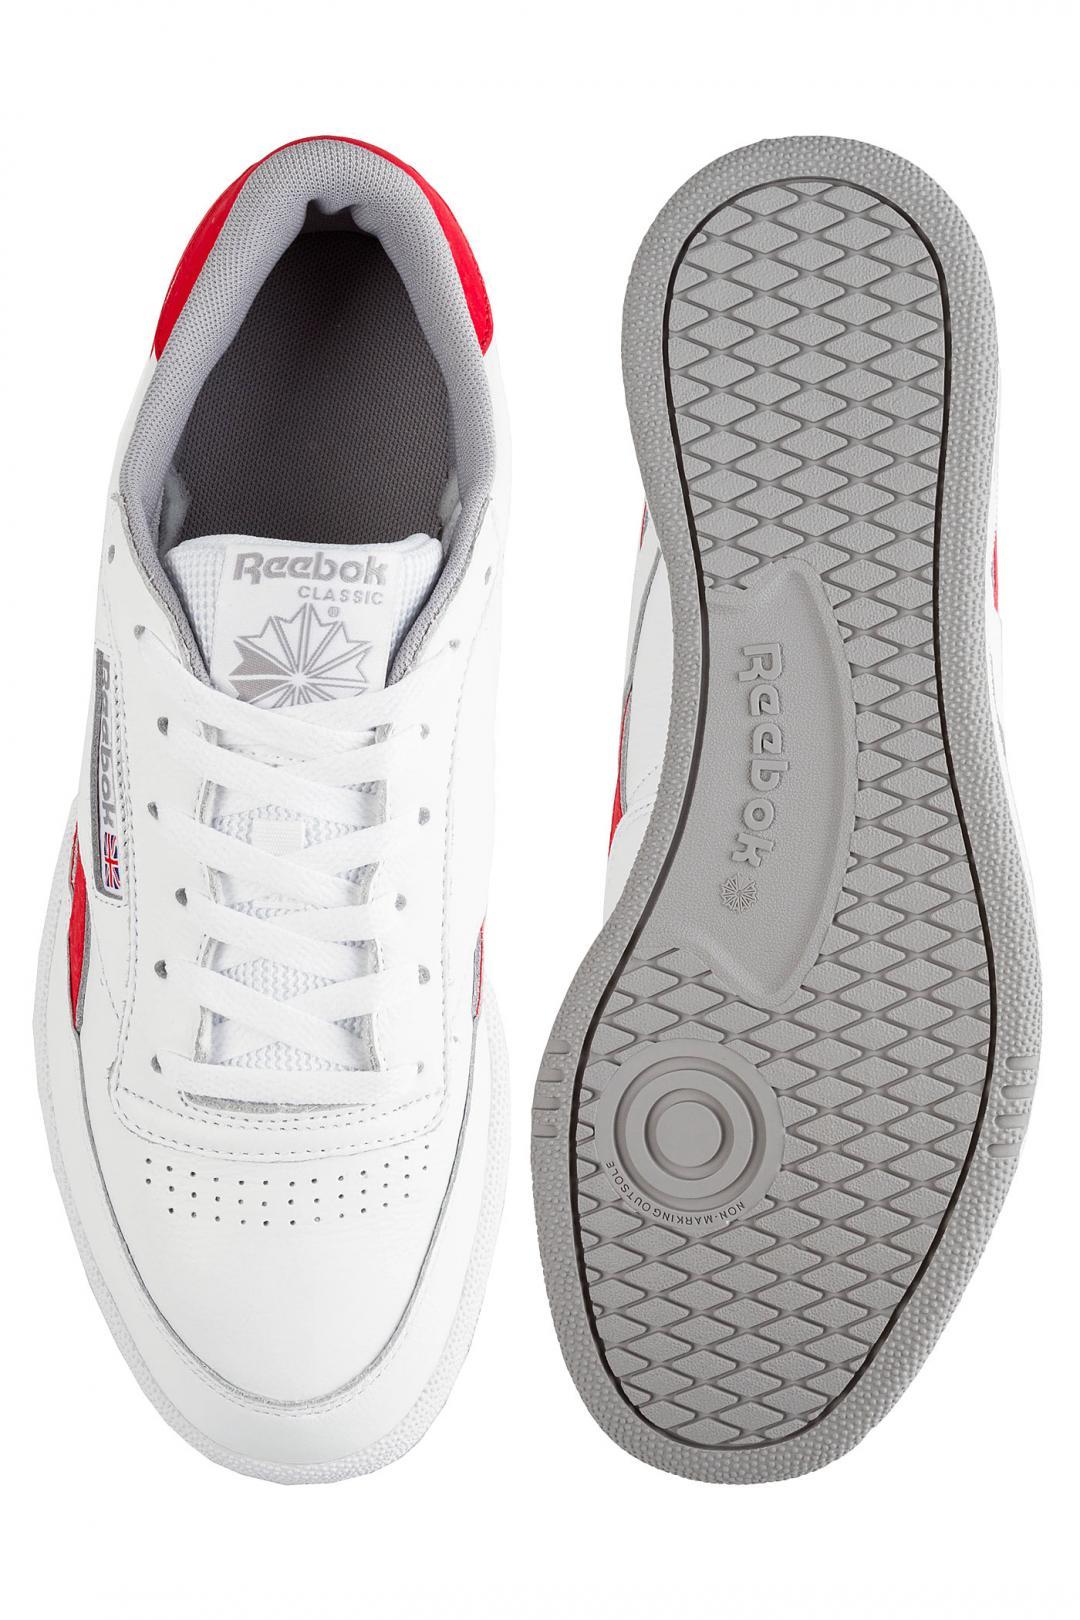 Uomo Reebok Revenge Plus MU white primal red | Sneaker